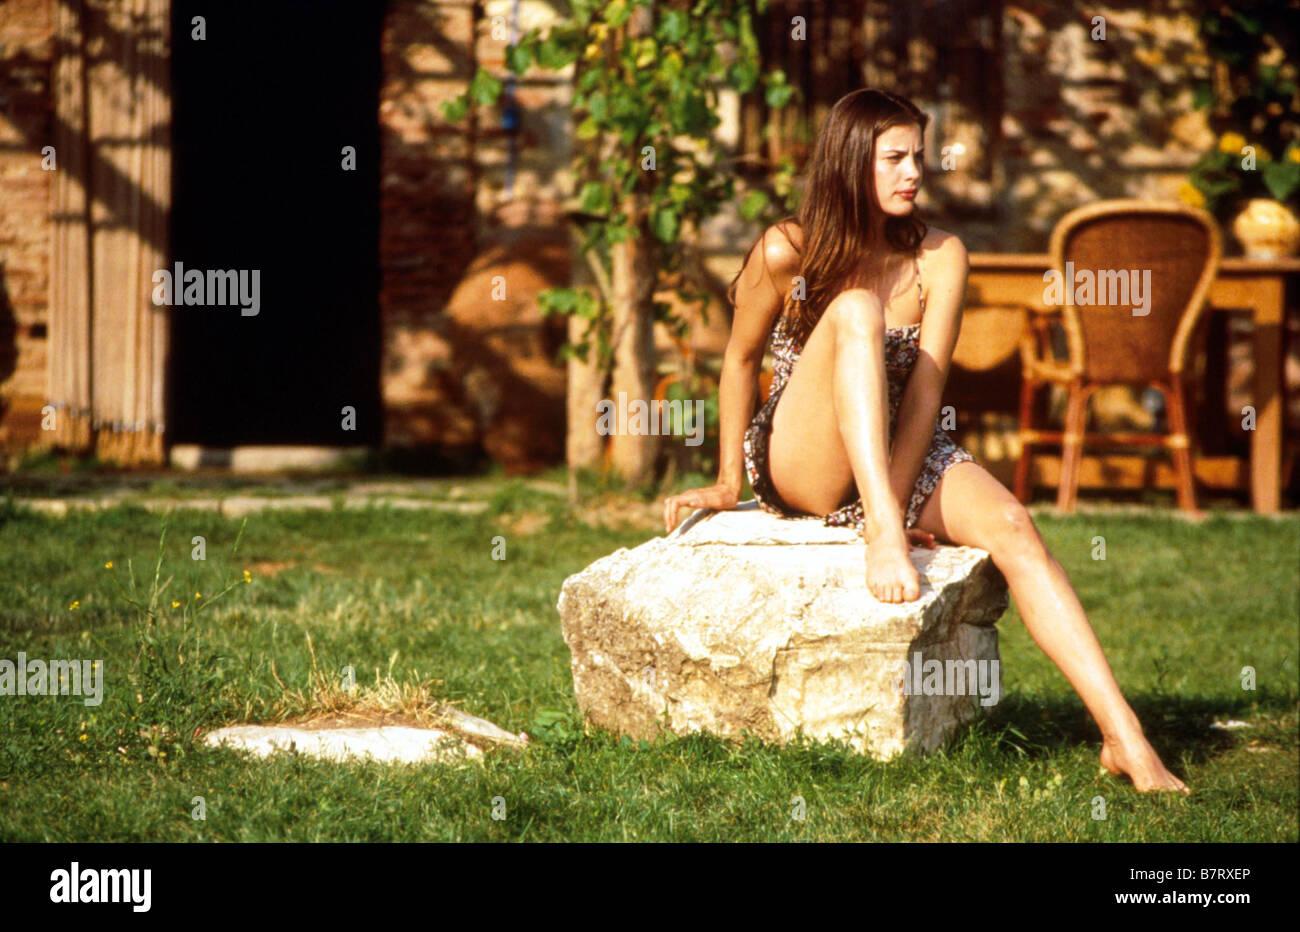 Beauté volée Stealing Beauty Année 1996 Italy France UK Liv Tyler Réalisateur Bernardo Bertolucci Stock Photo